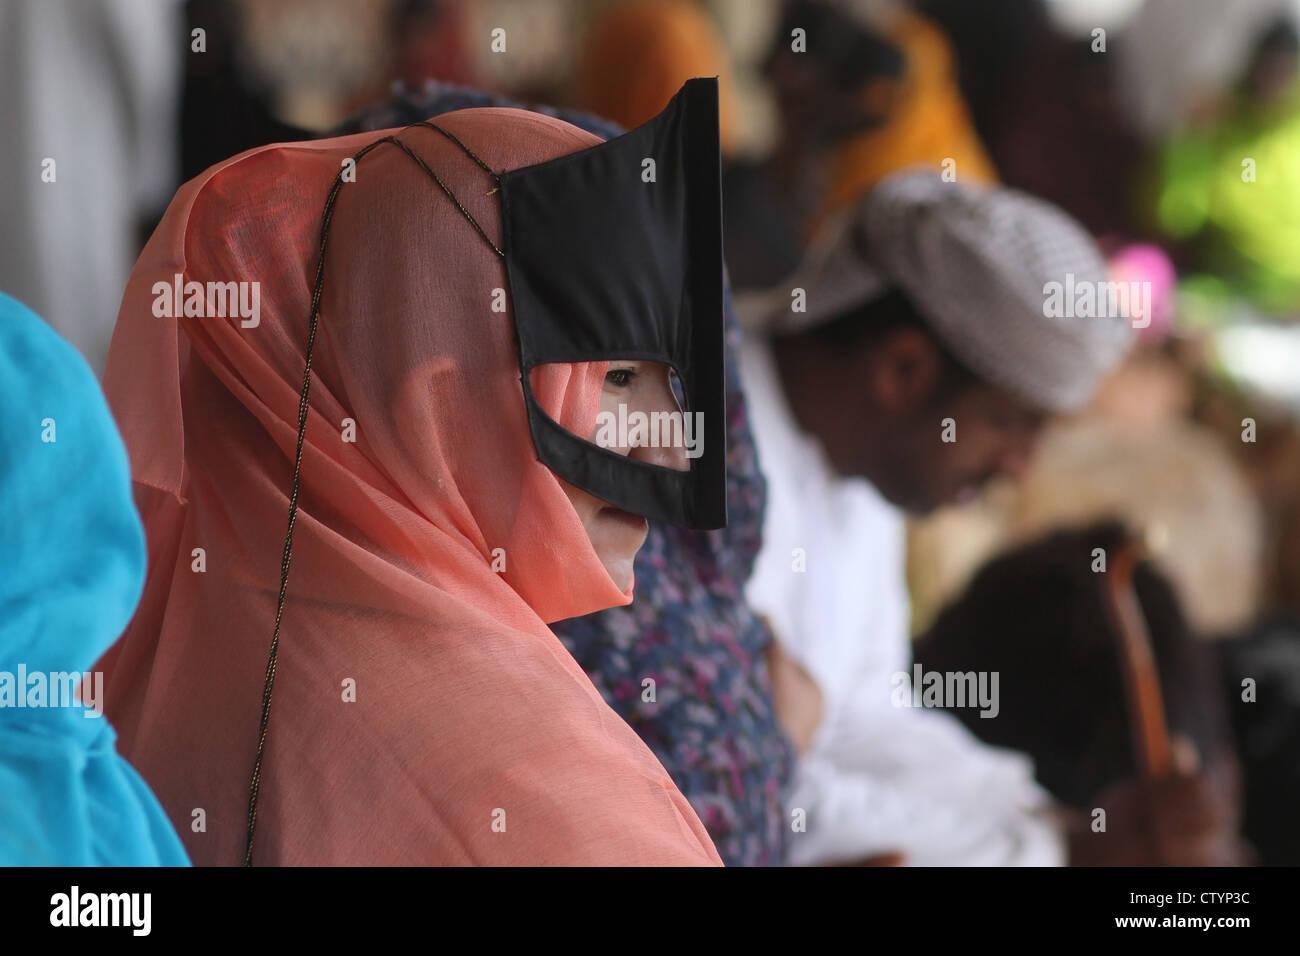 Muslim woman wearing mask and niqaab - Stock Image